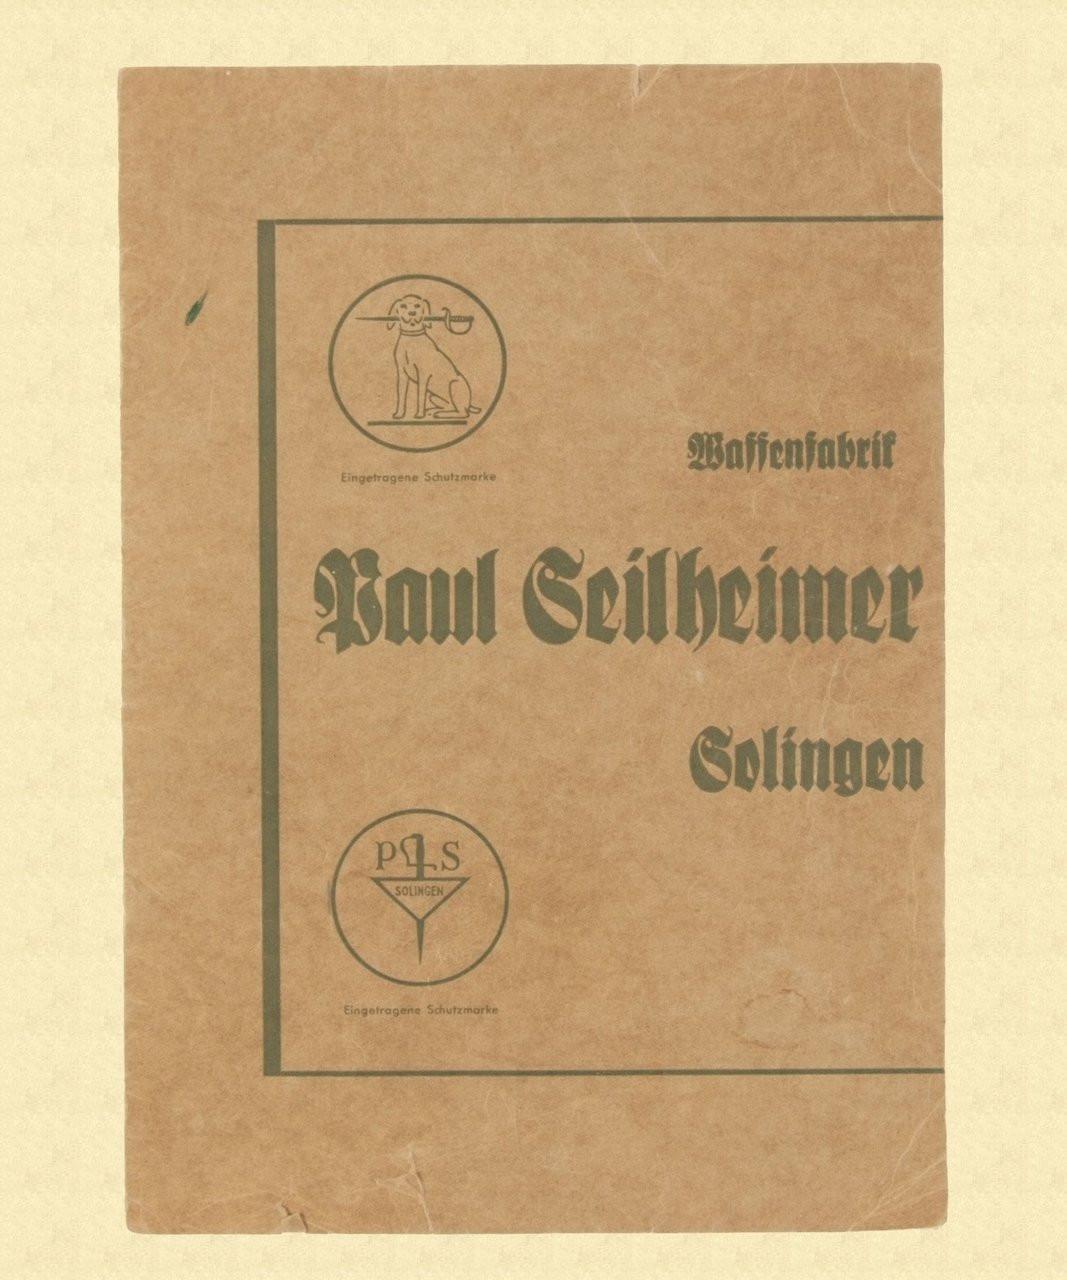 GERMAN SWORD AND DAGGER SALES BROCHURE - C10815